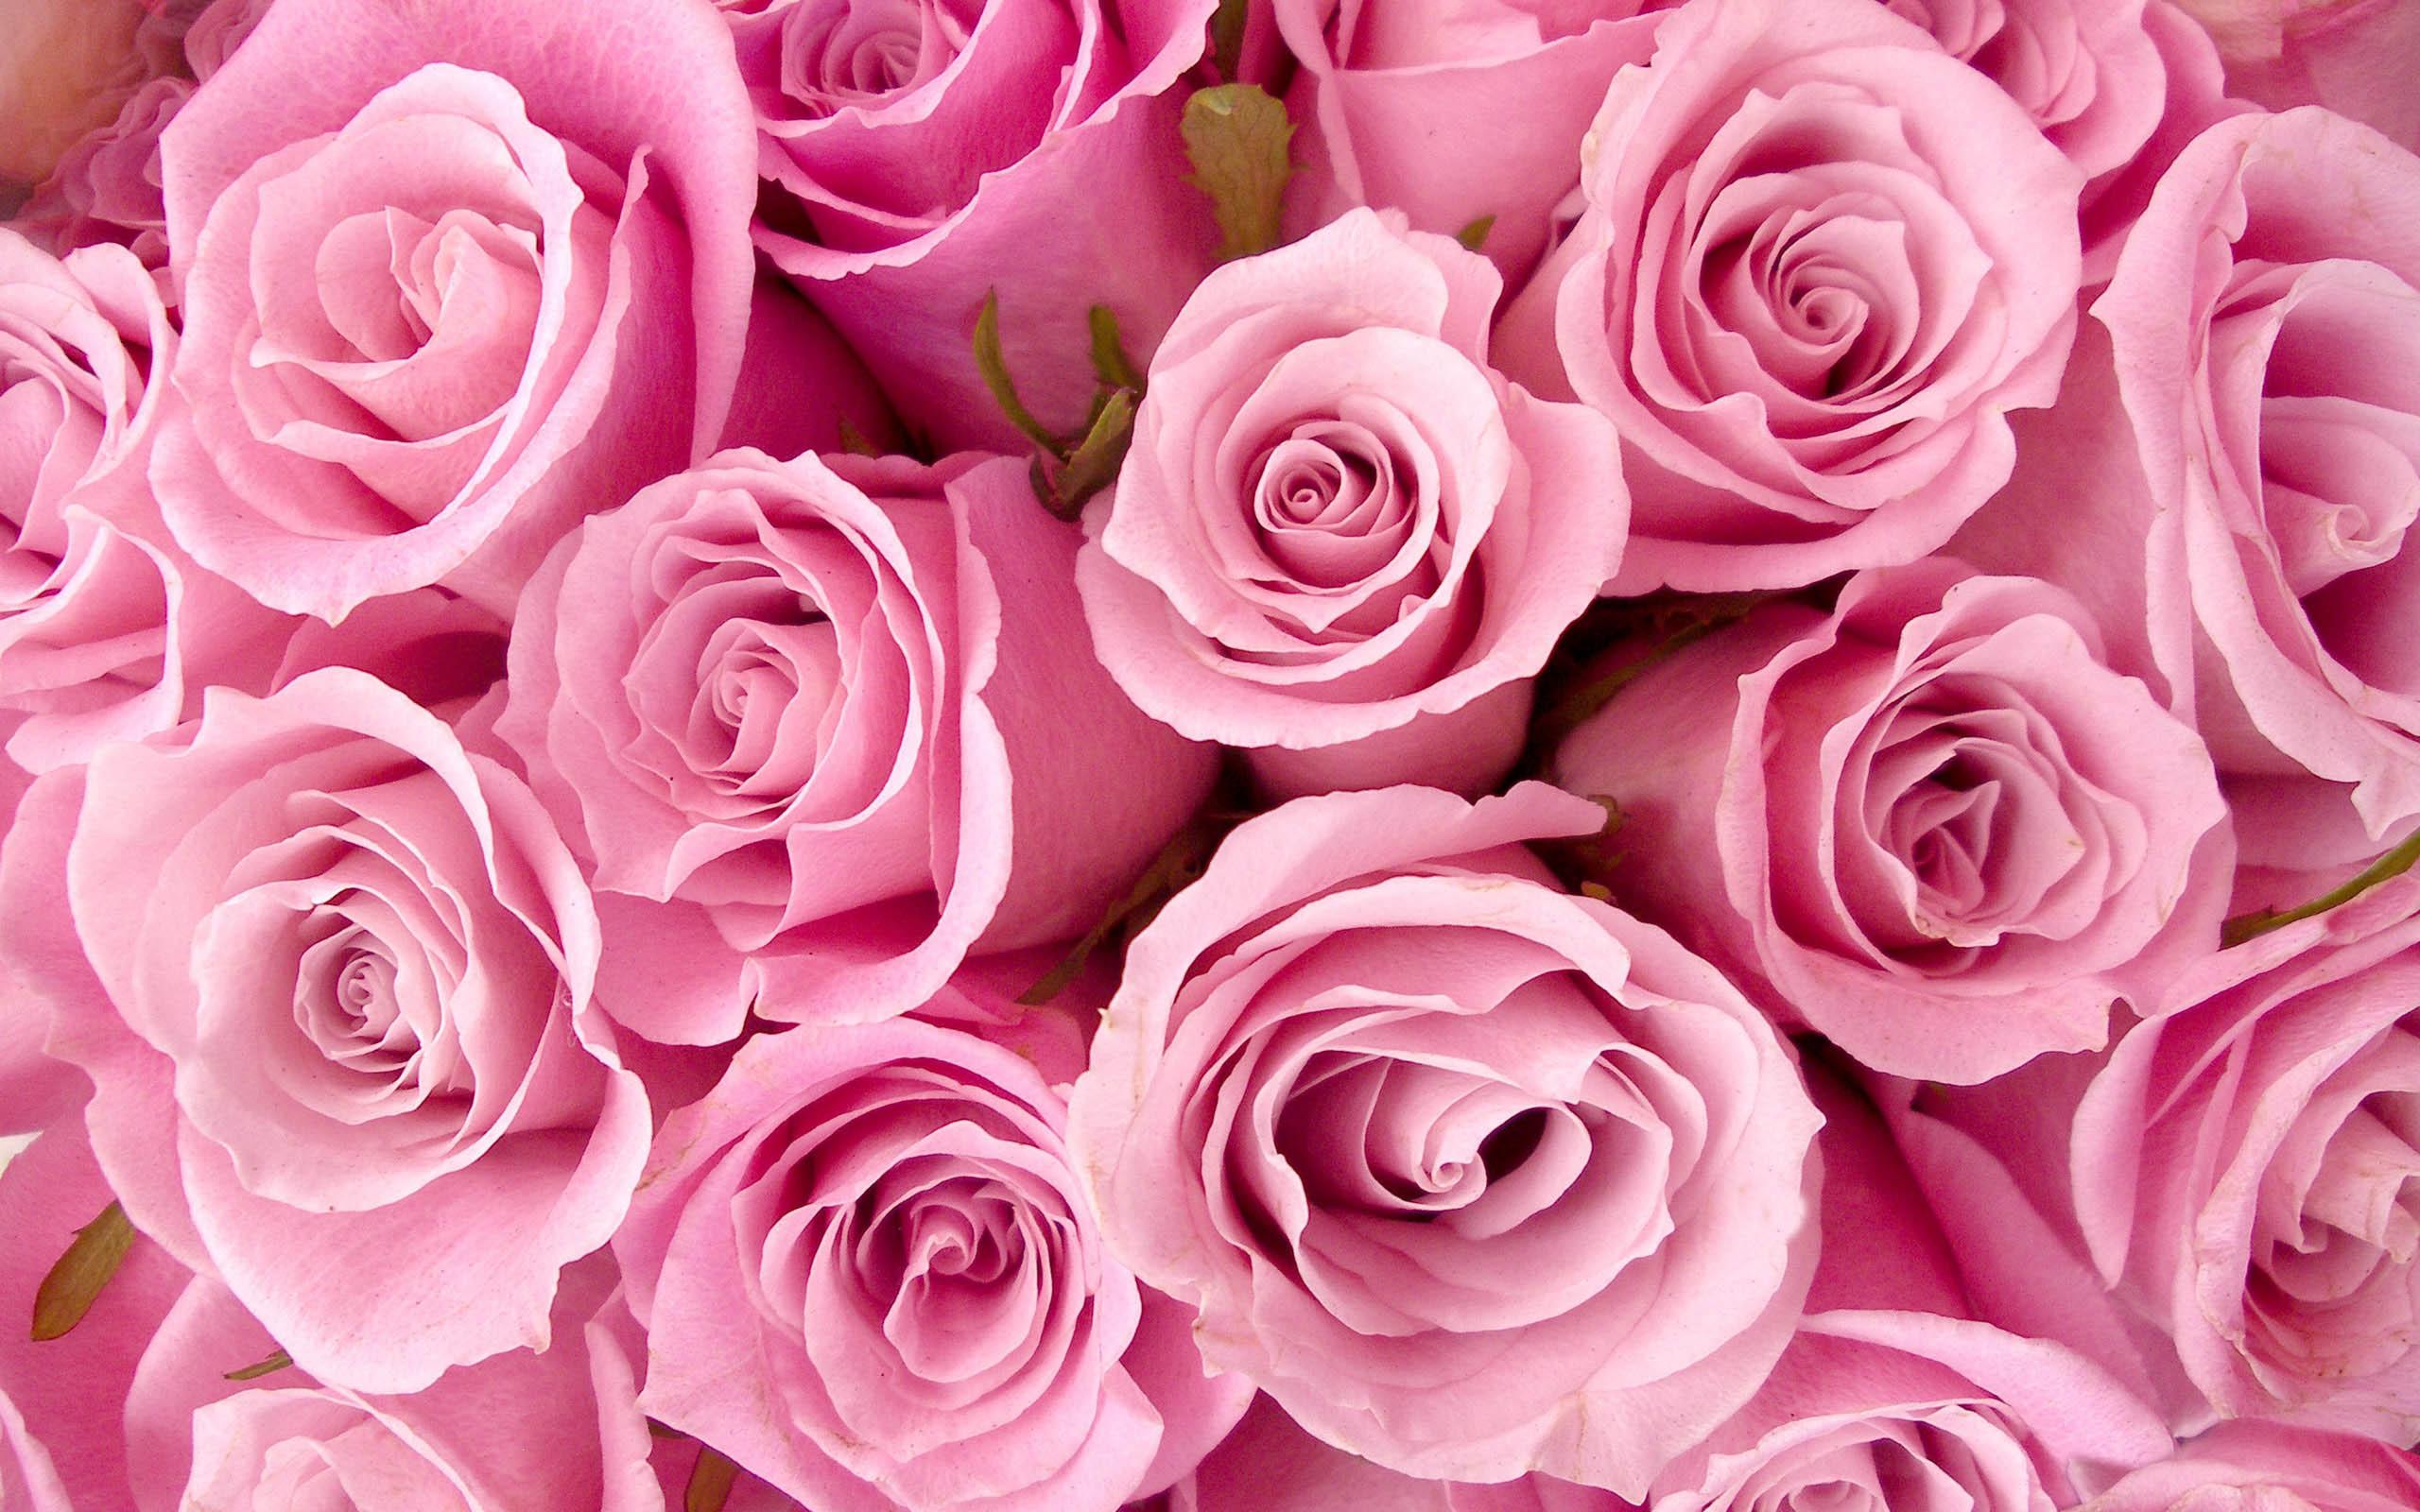 60 Free Rose Wallpapers On Wallpapersafari